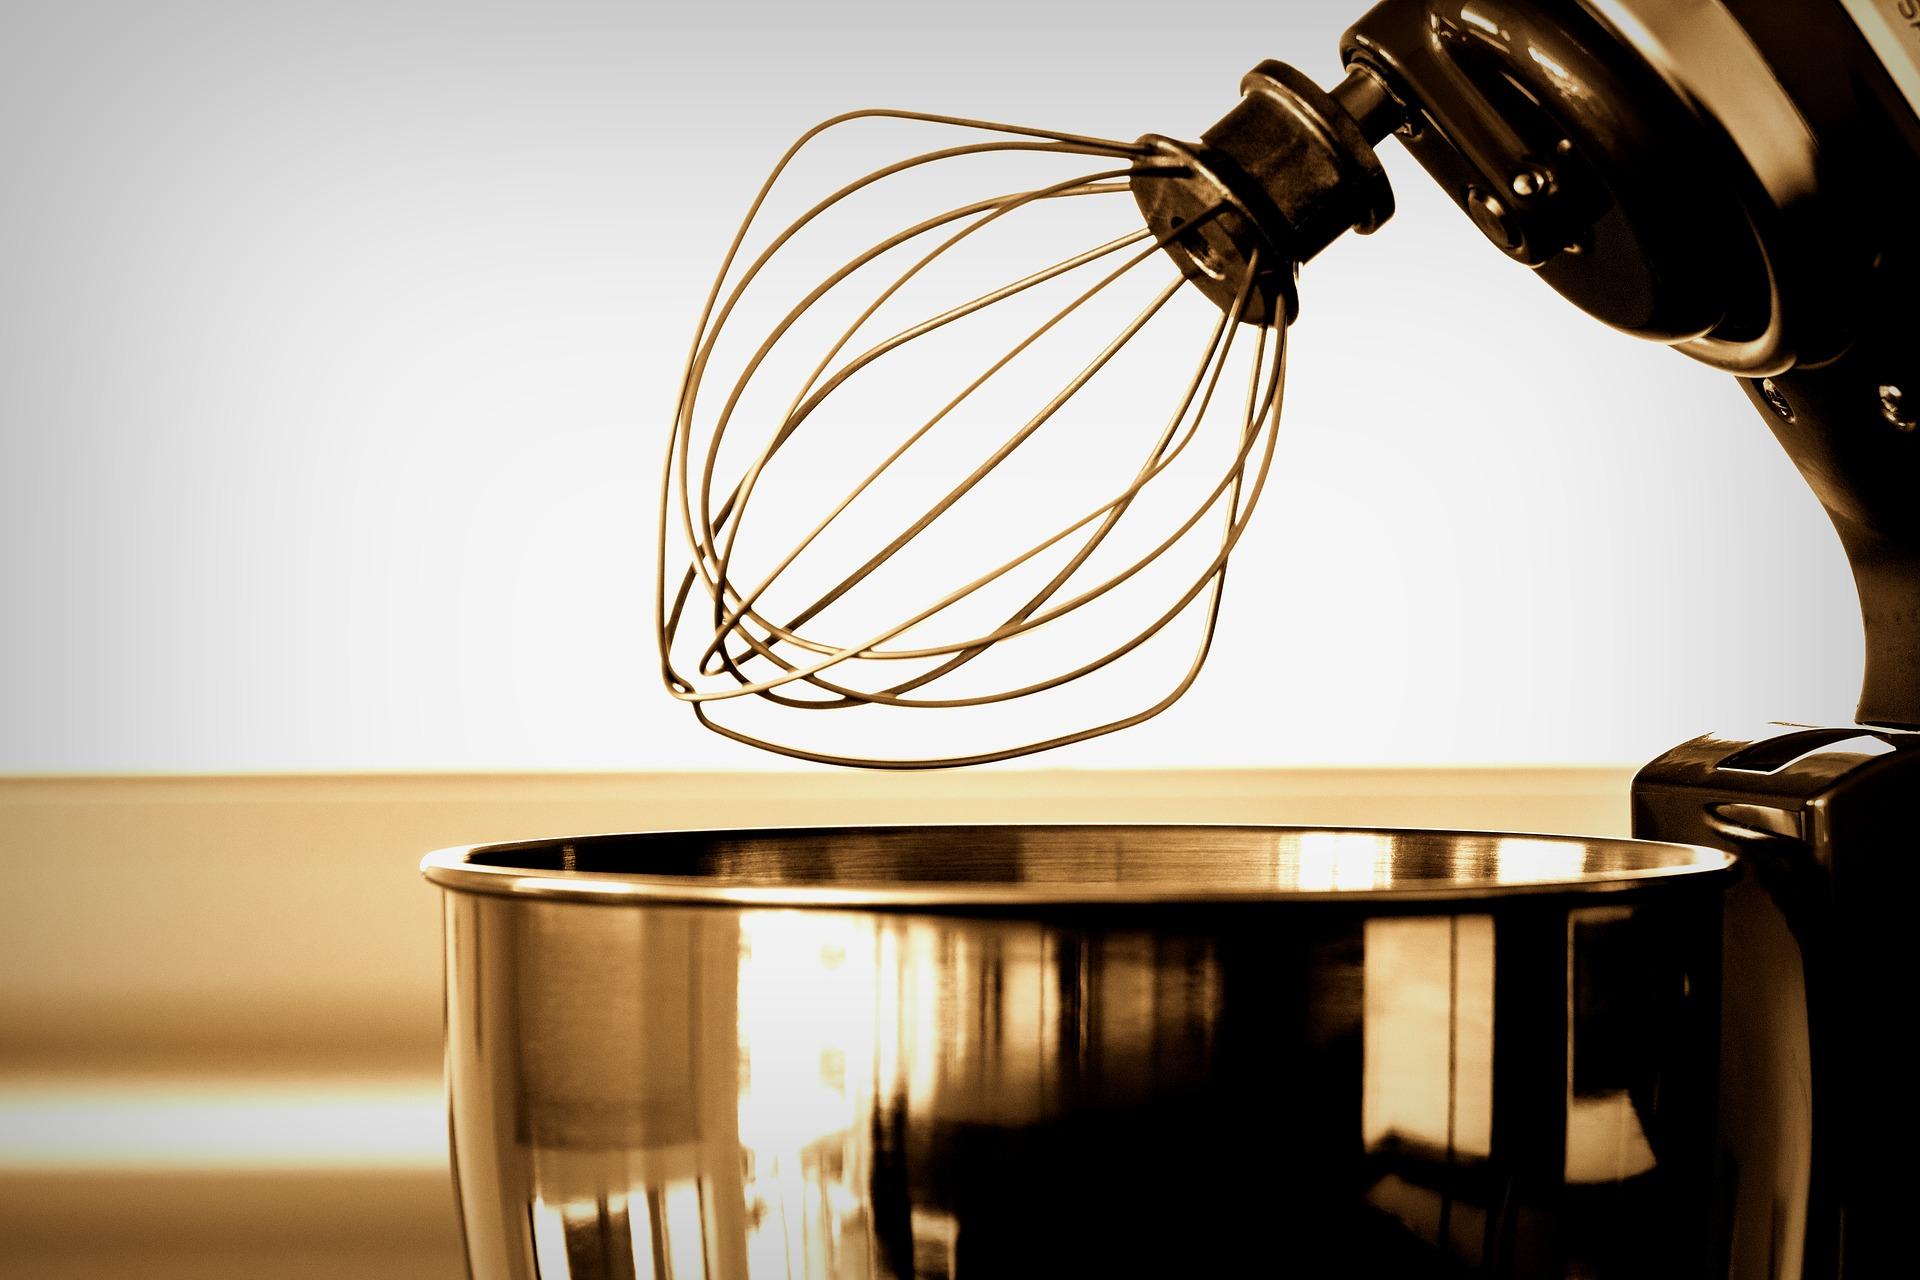 Kuechengeraete Test Küchengeräte Test